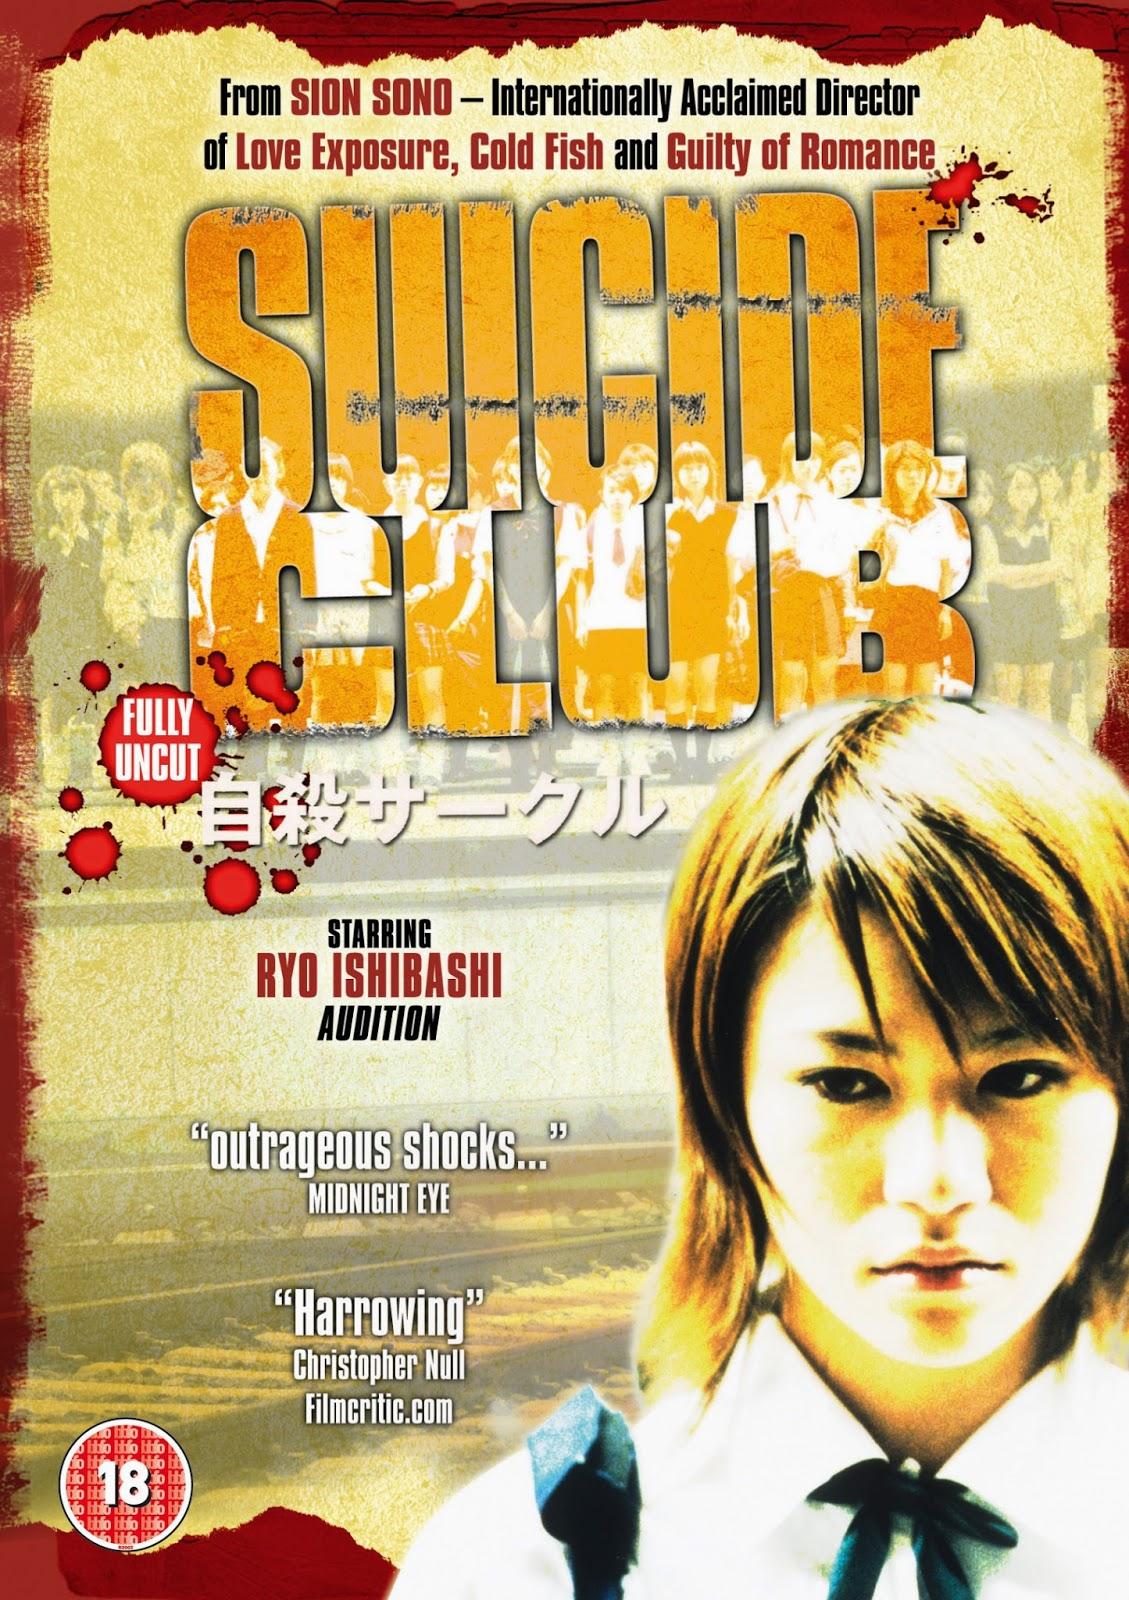 73715c395df Film Trailers World: 2011